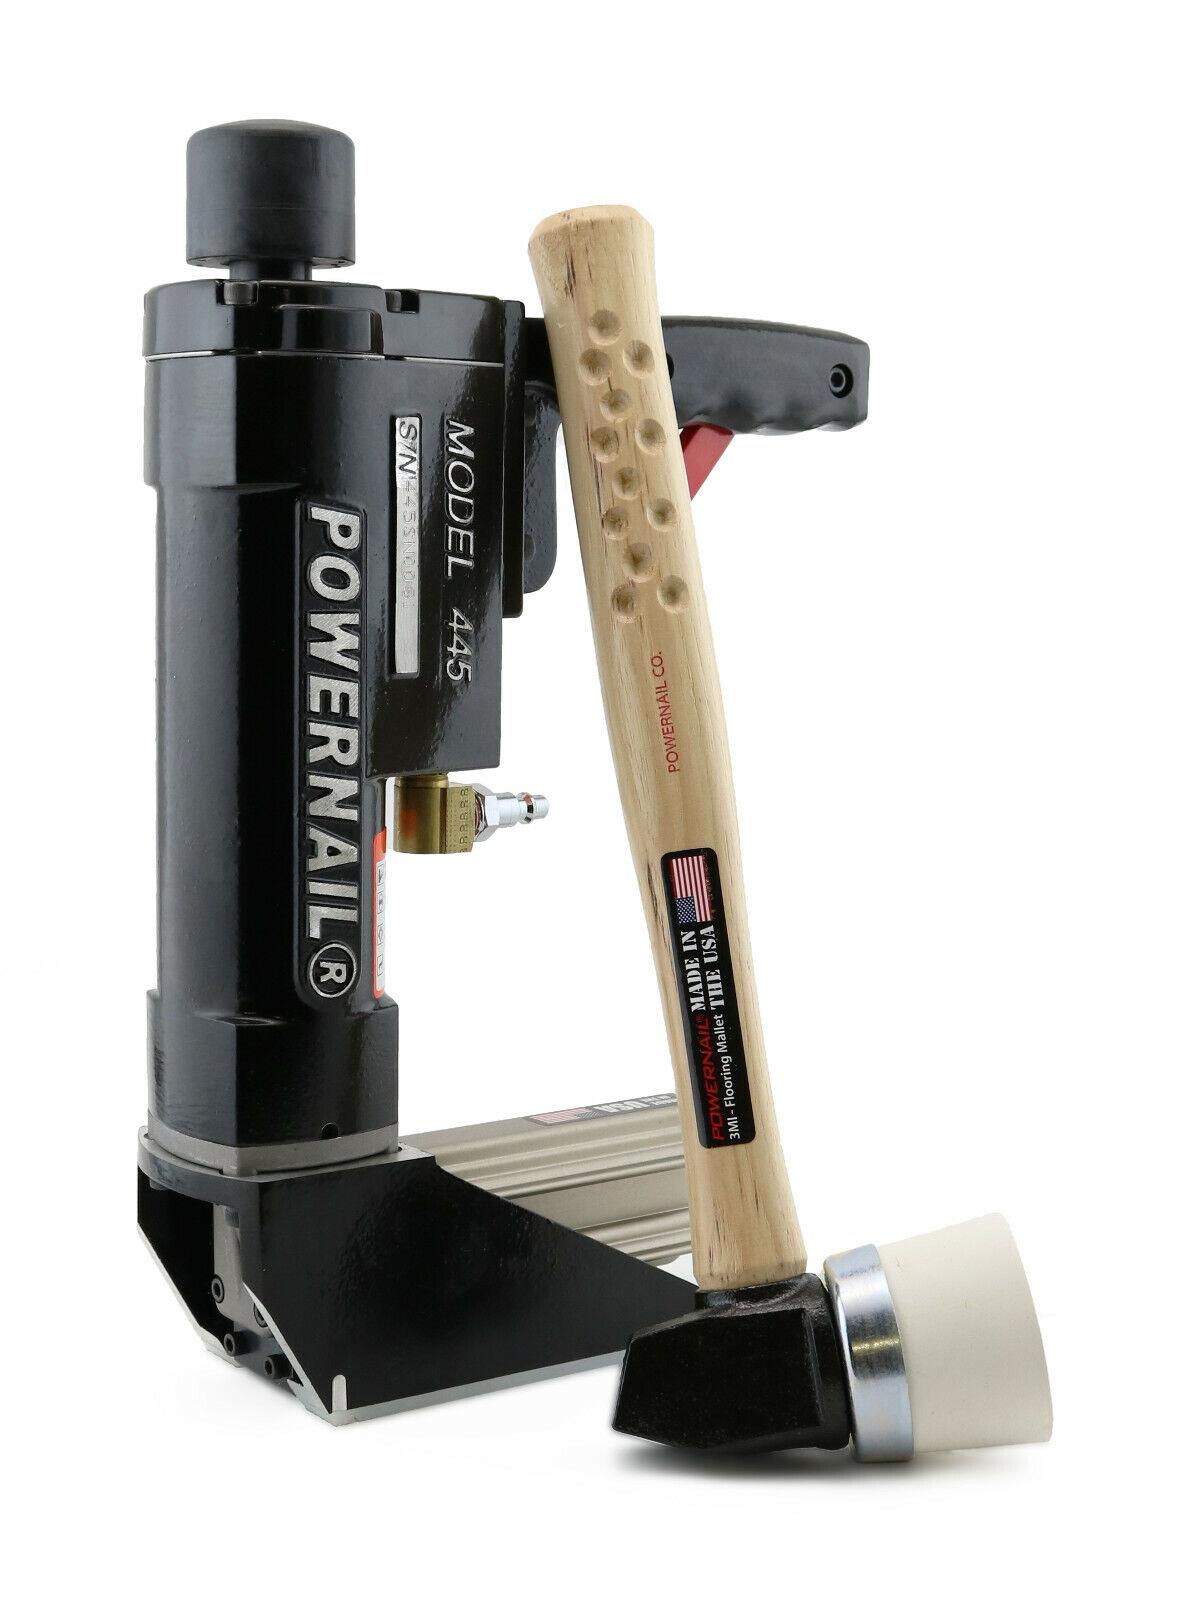 Powernail 445SNW 16-Gauge Pneumatic Surface Nailer for Wood